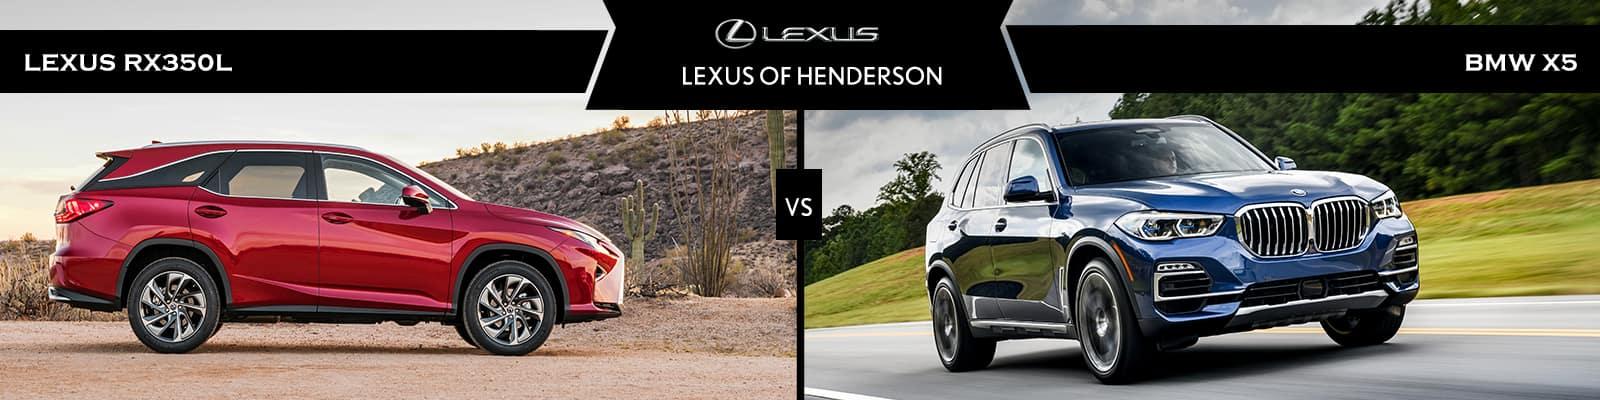 Lexus RX 350L vs BMW X5